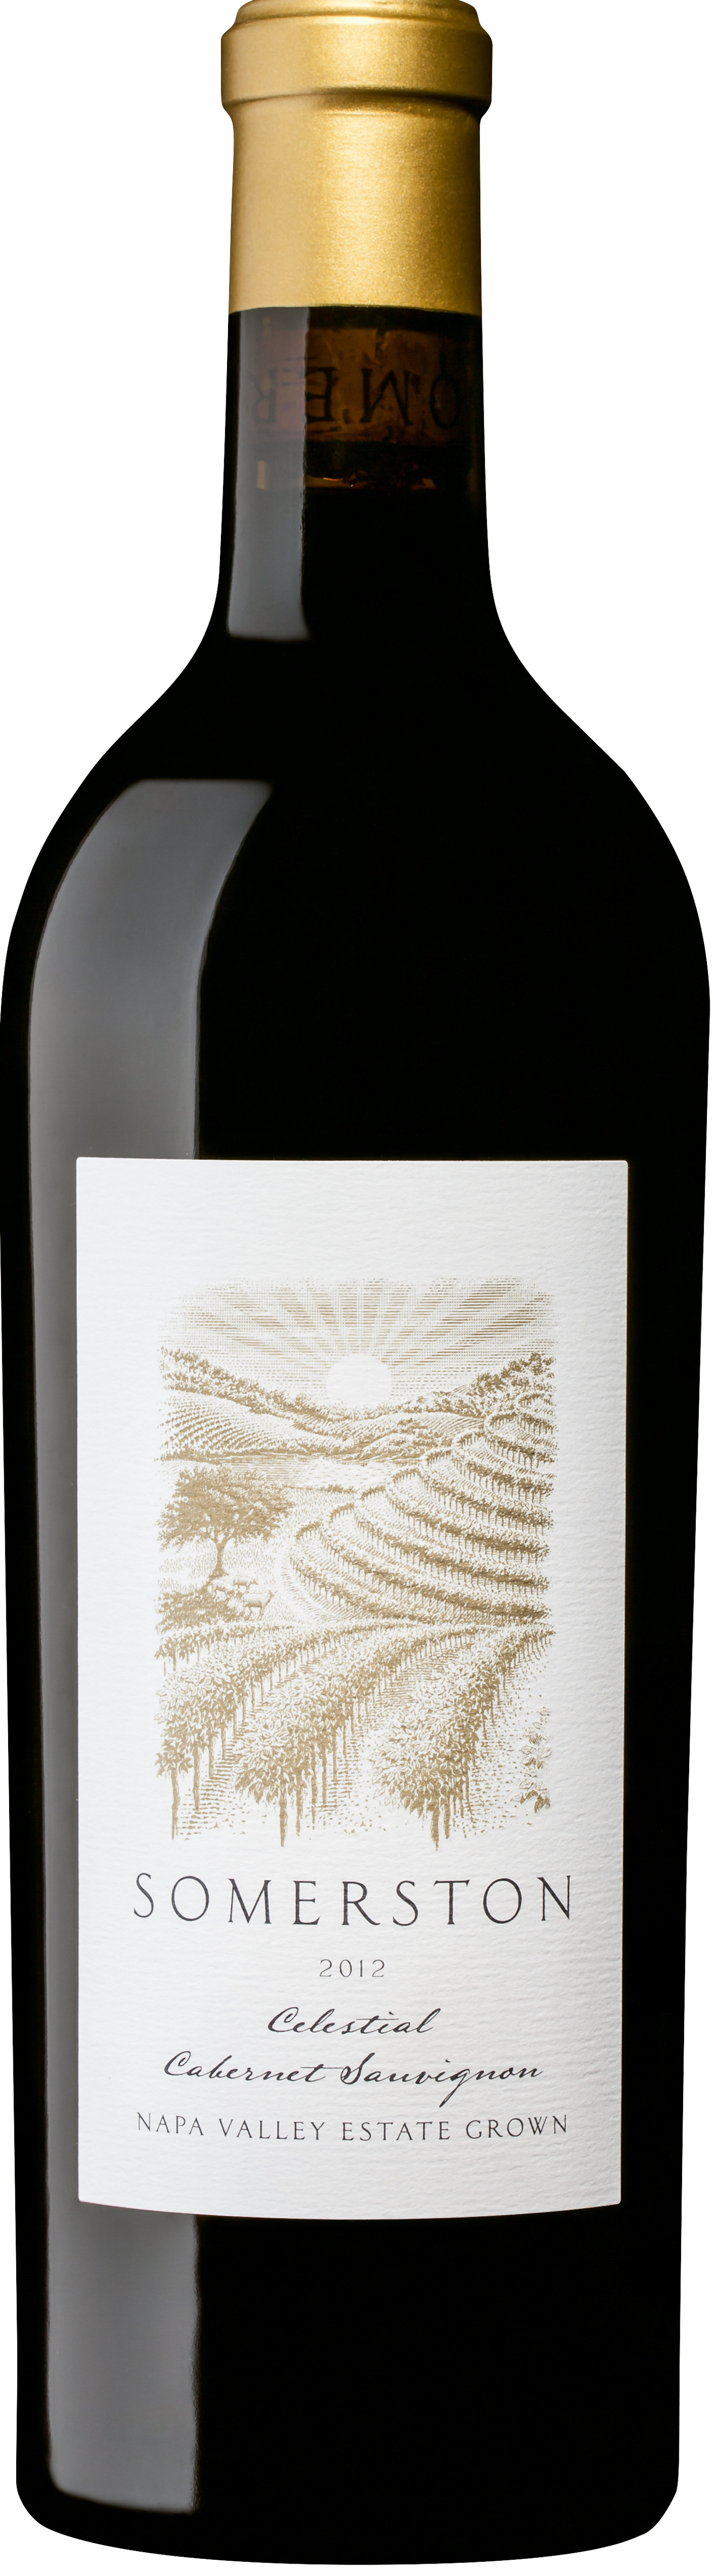 Somerston – Cabernet Sauvignon, Napa